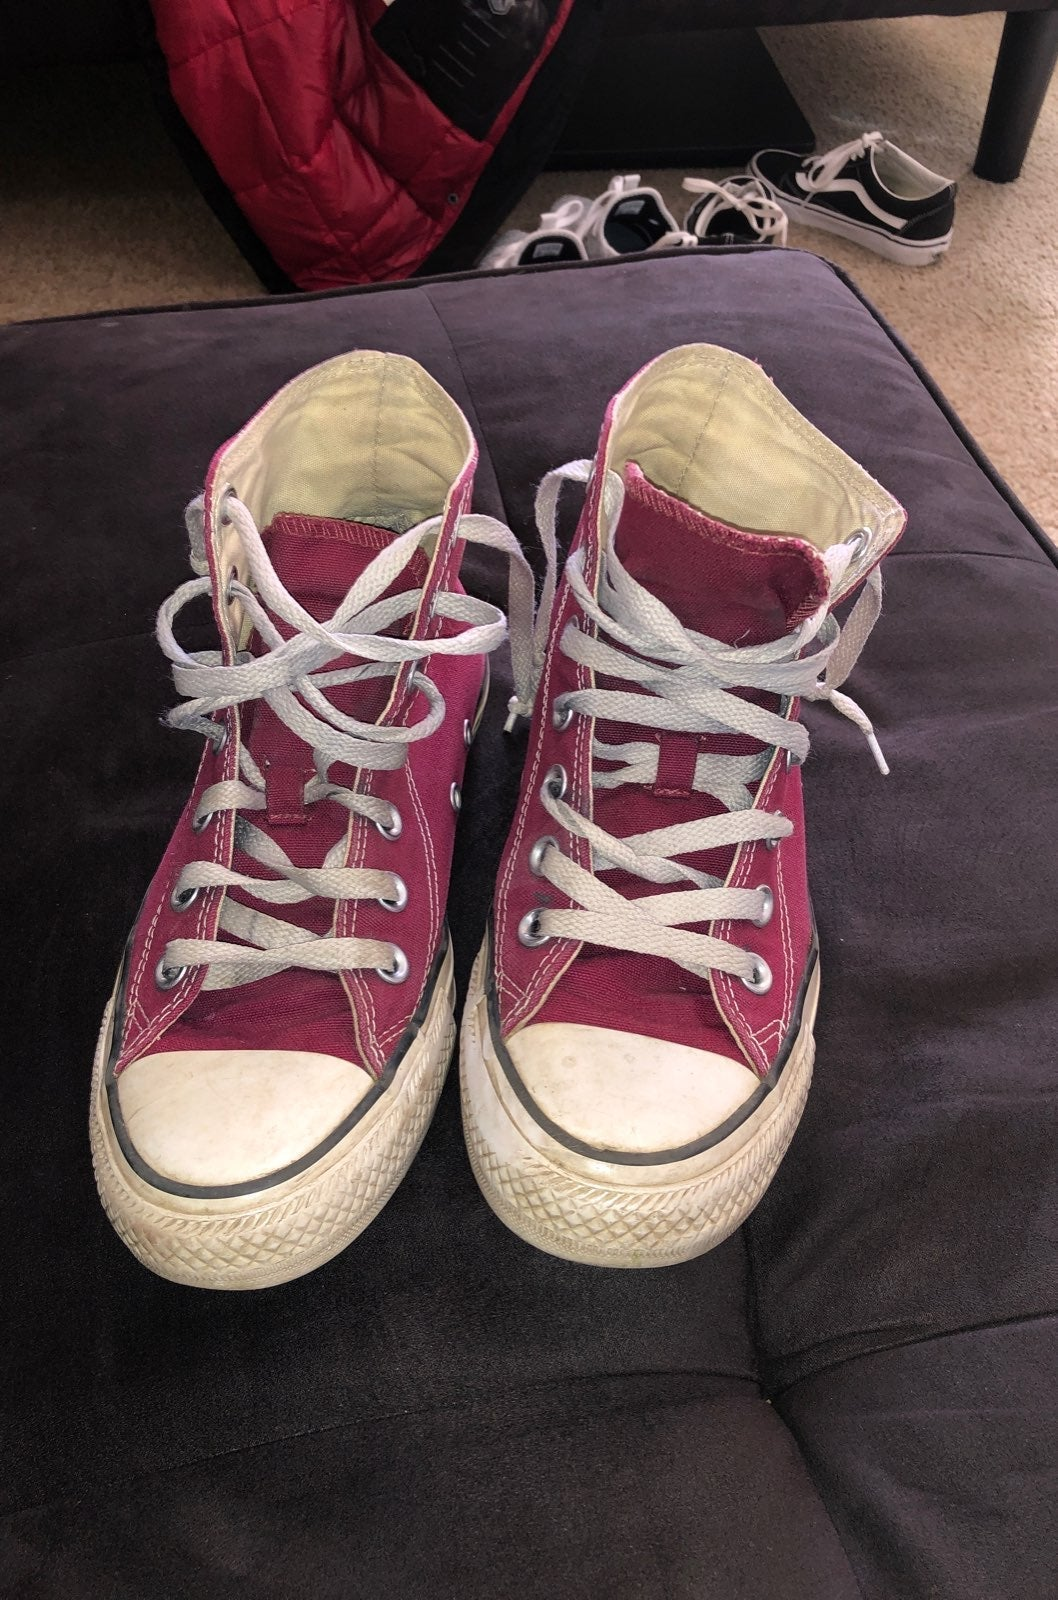 Converse chuck taylor all star fashion s